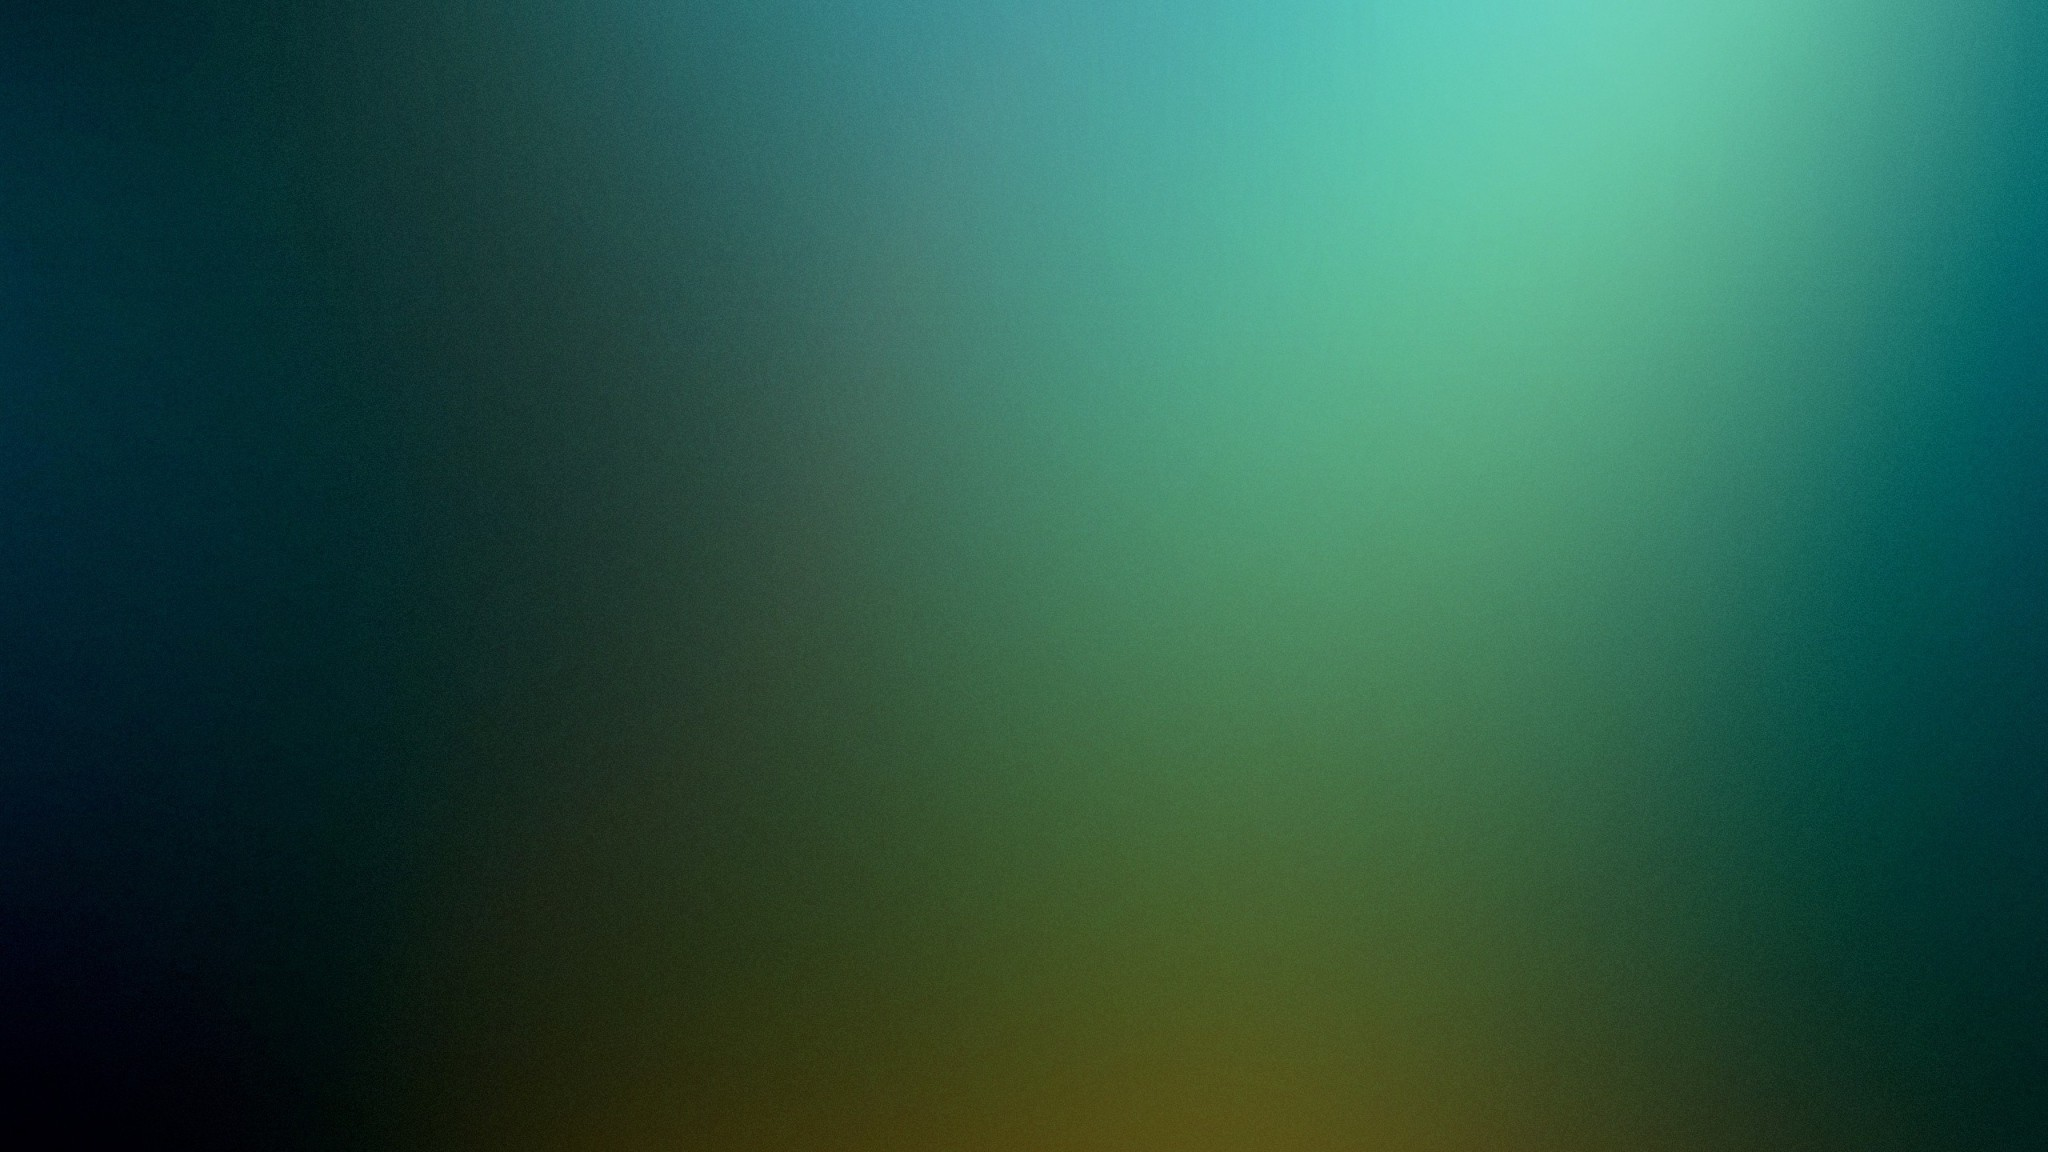 Grunge Wallpaper 1280x720  Impremedianet